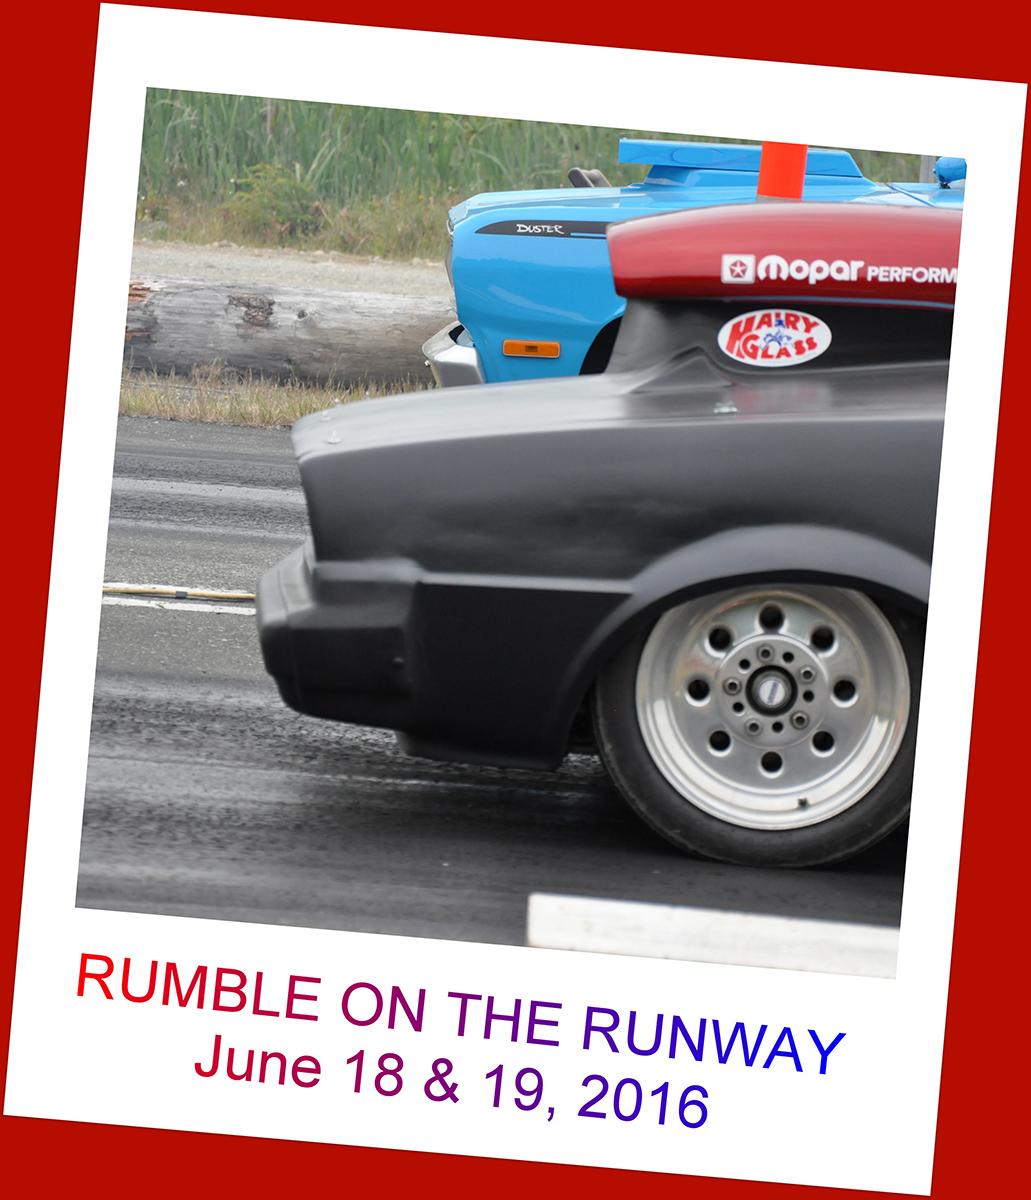 Rumble on the Runway June 18 & 19, 2016 167